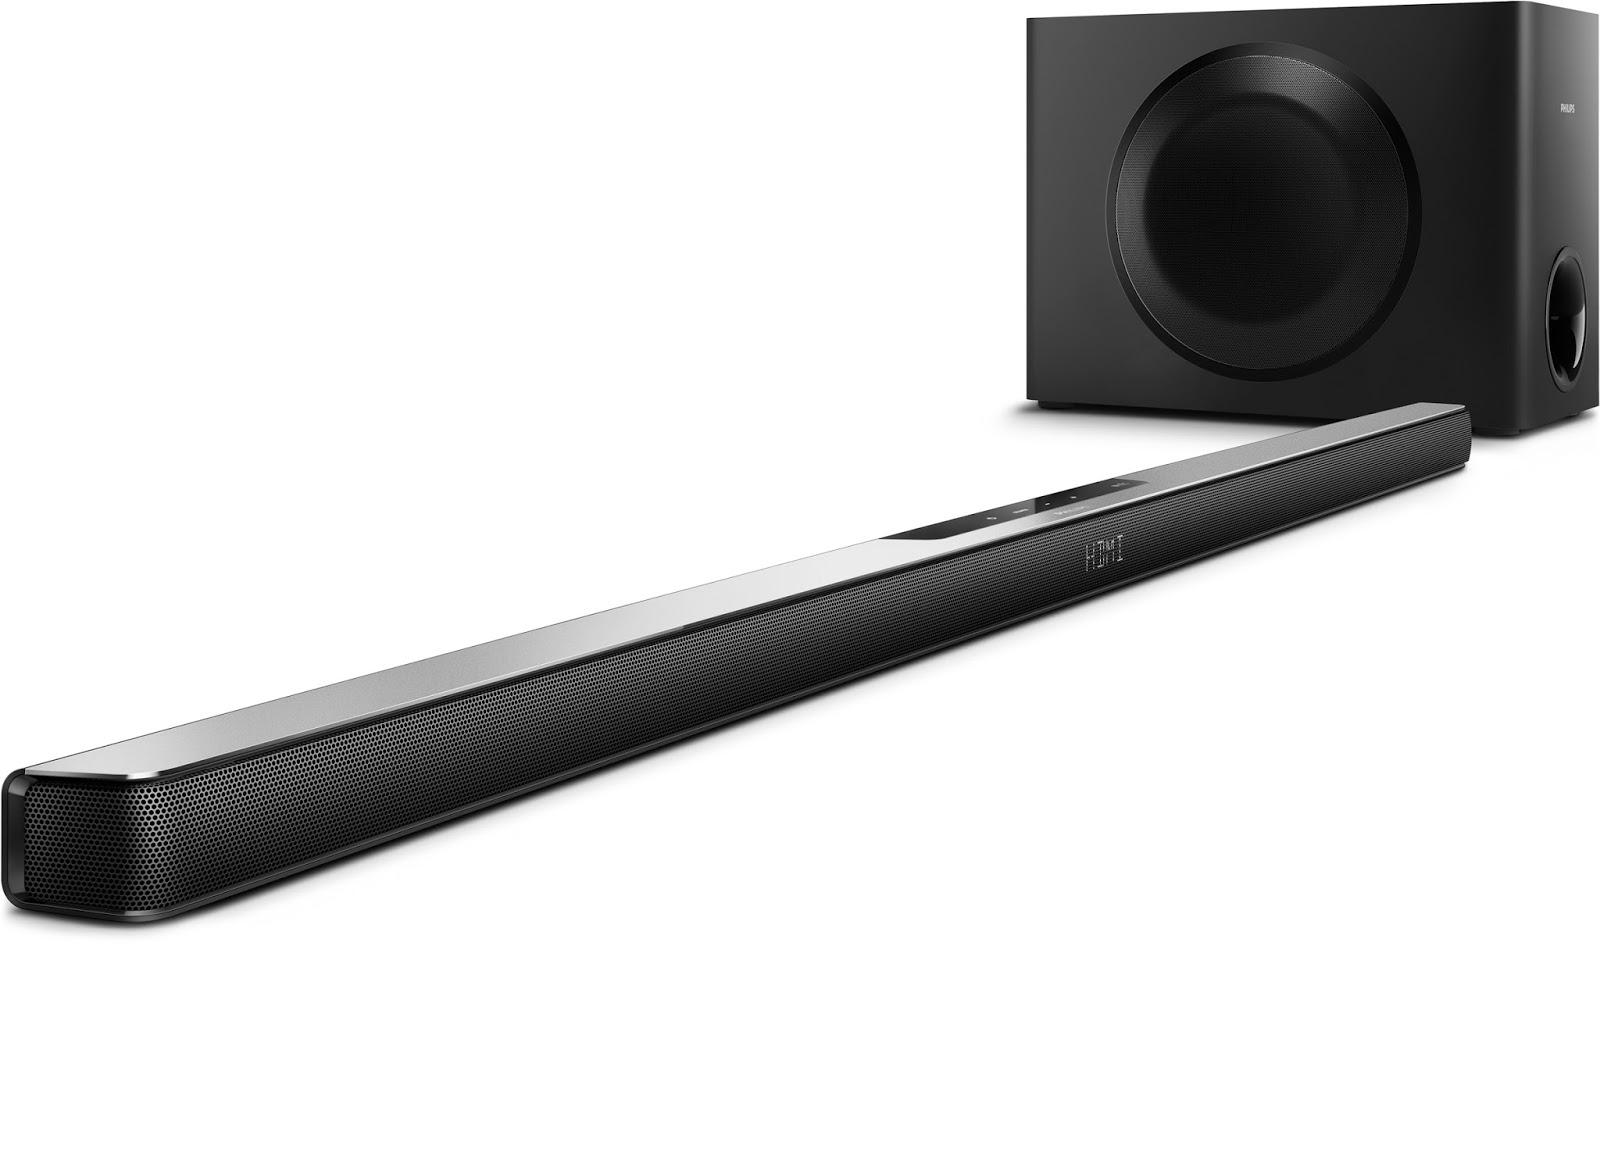 Gibson Innovations Creates Tsunami Of Sound With Its 2015 Line Up Philips Fidelio M2l Headphone Hitam Serta Tidak Berselerak Disebabkan Banyaknya Pembesar Suara Dan Kabel Htl7140b Dibina Dengan Dua Pemacu Khas Amplifier Masing